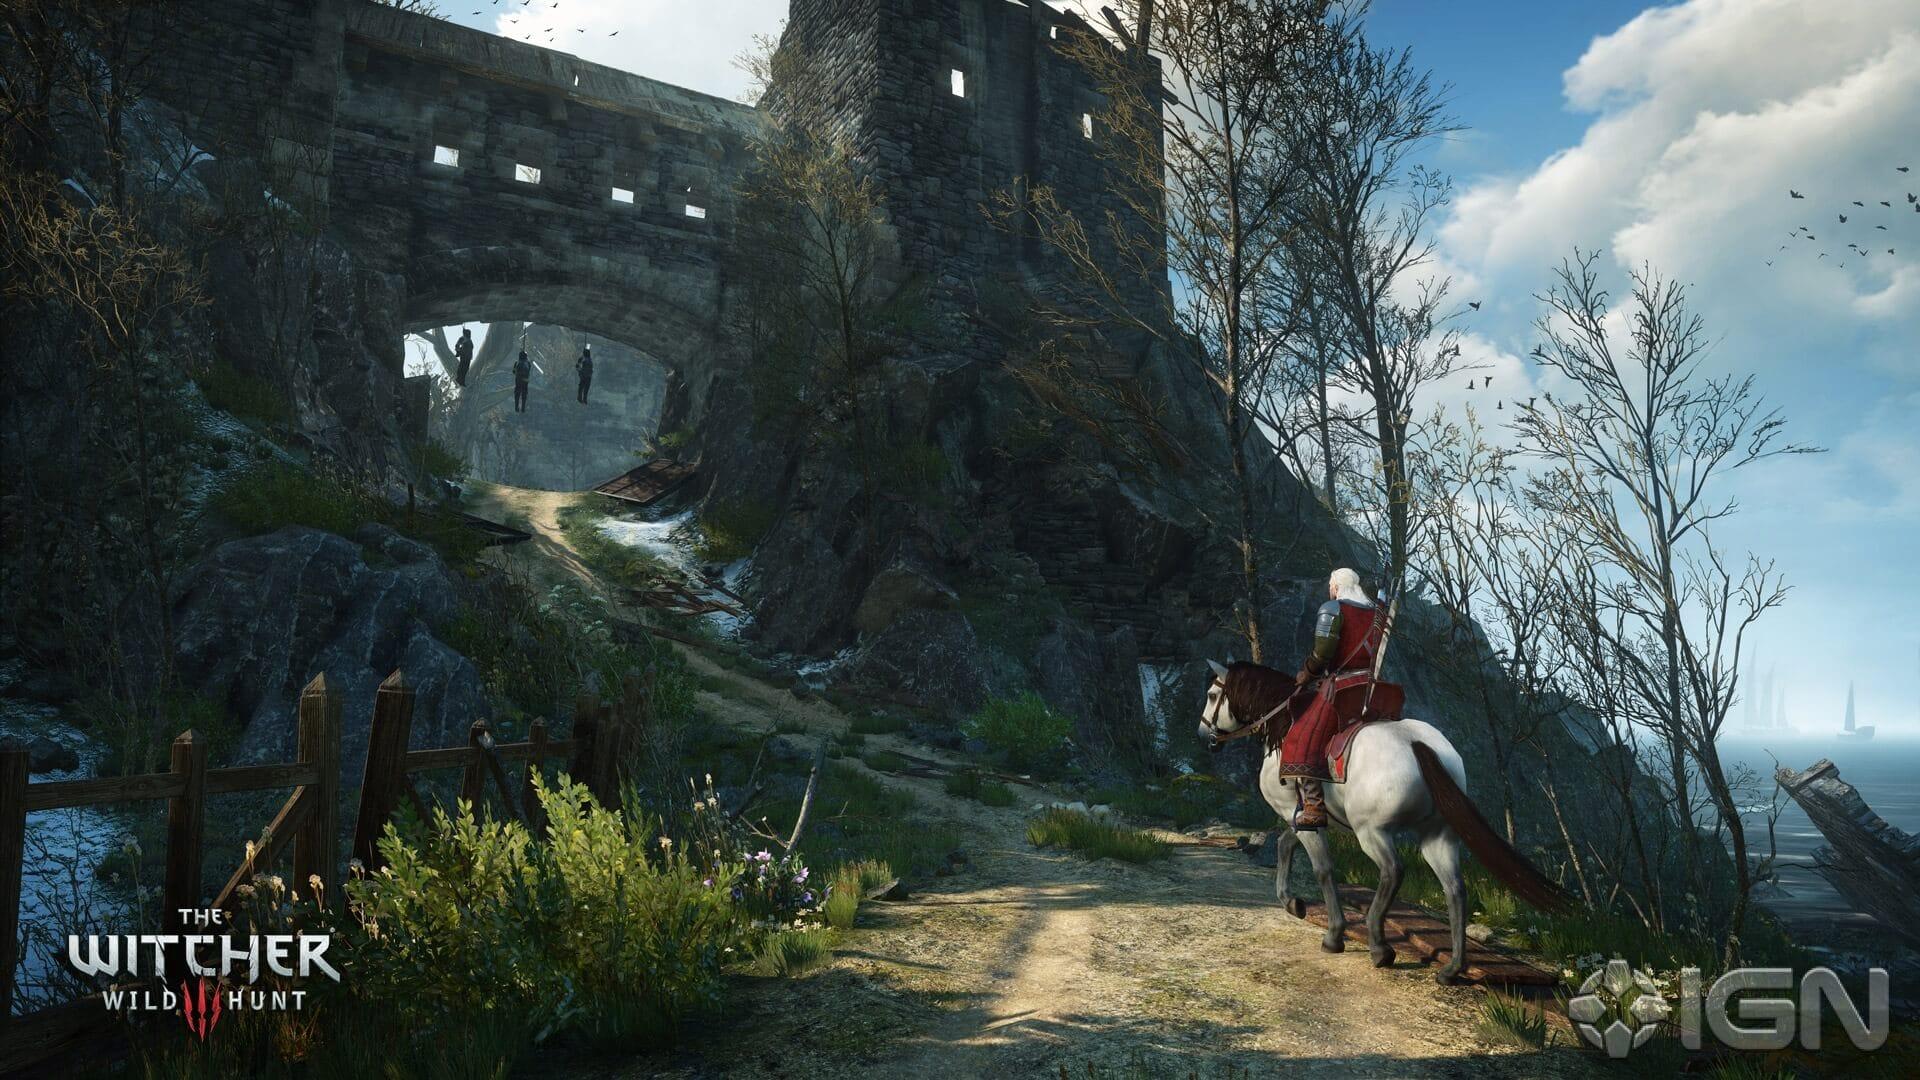 The Witcher 3: Wild Hunt Hanging Screenshot